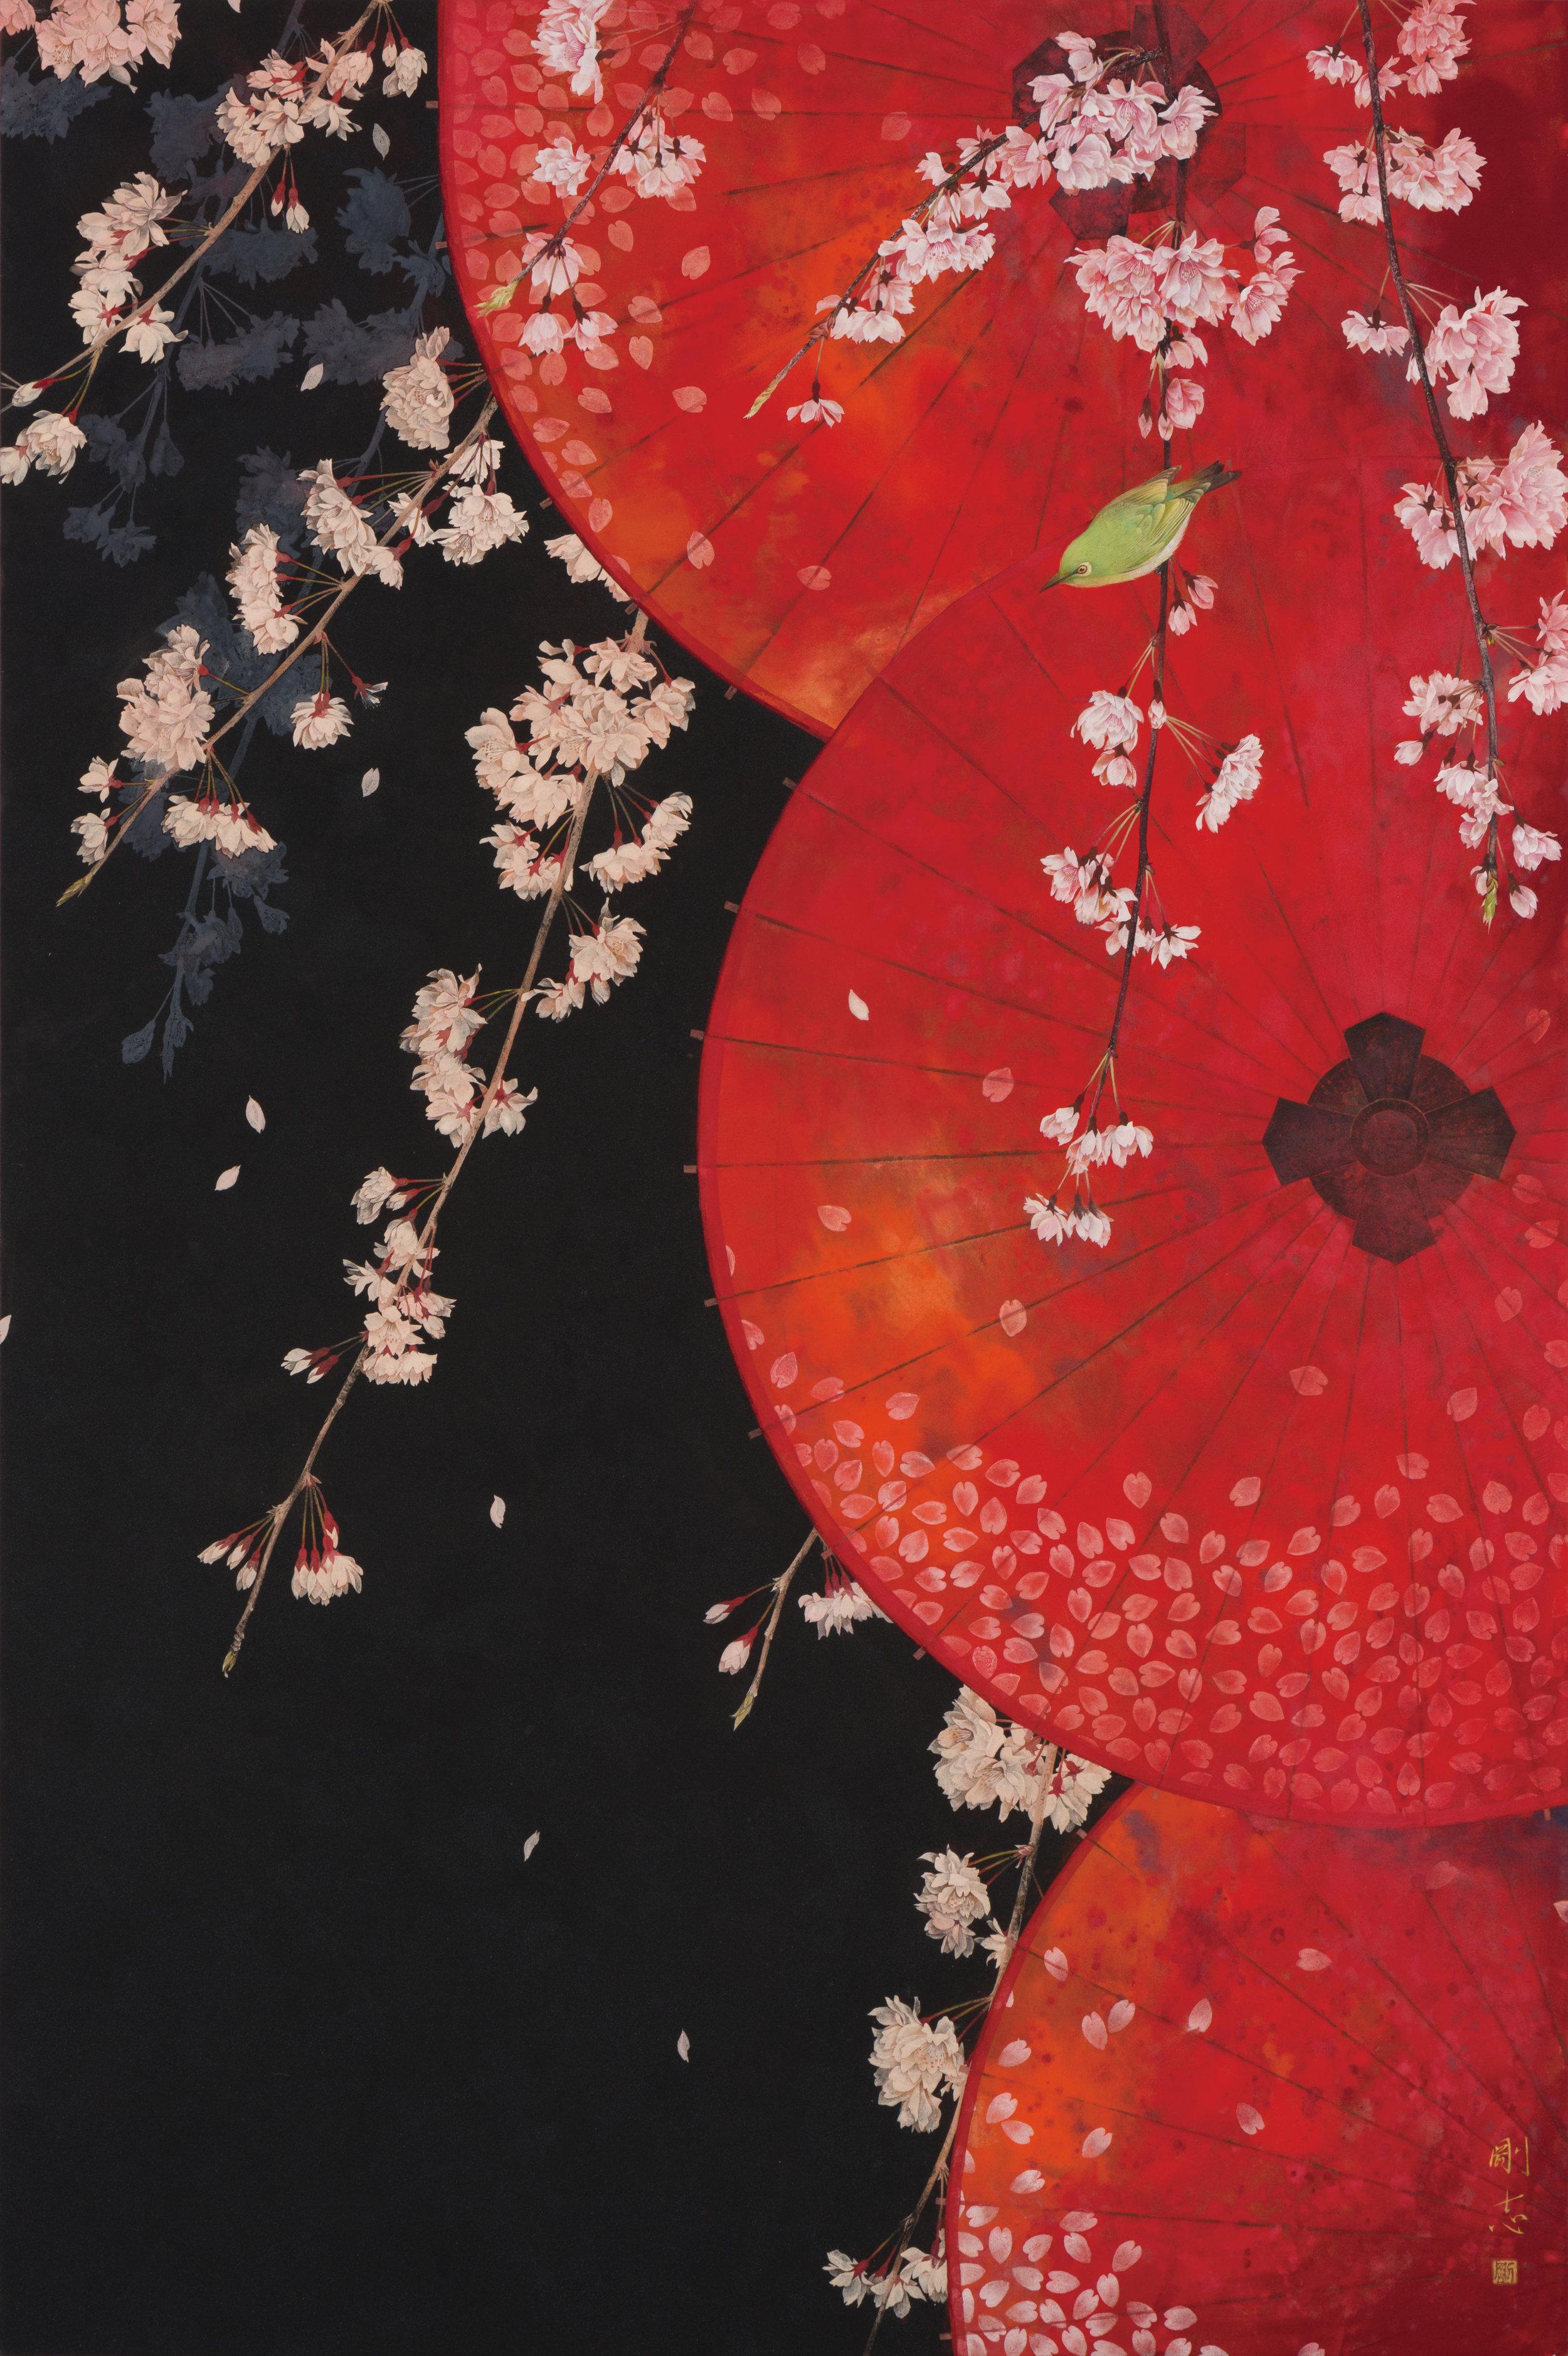 Takashi Nagoya 'A Long Dream of Spring' - 2013